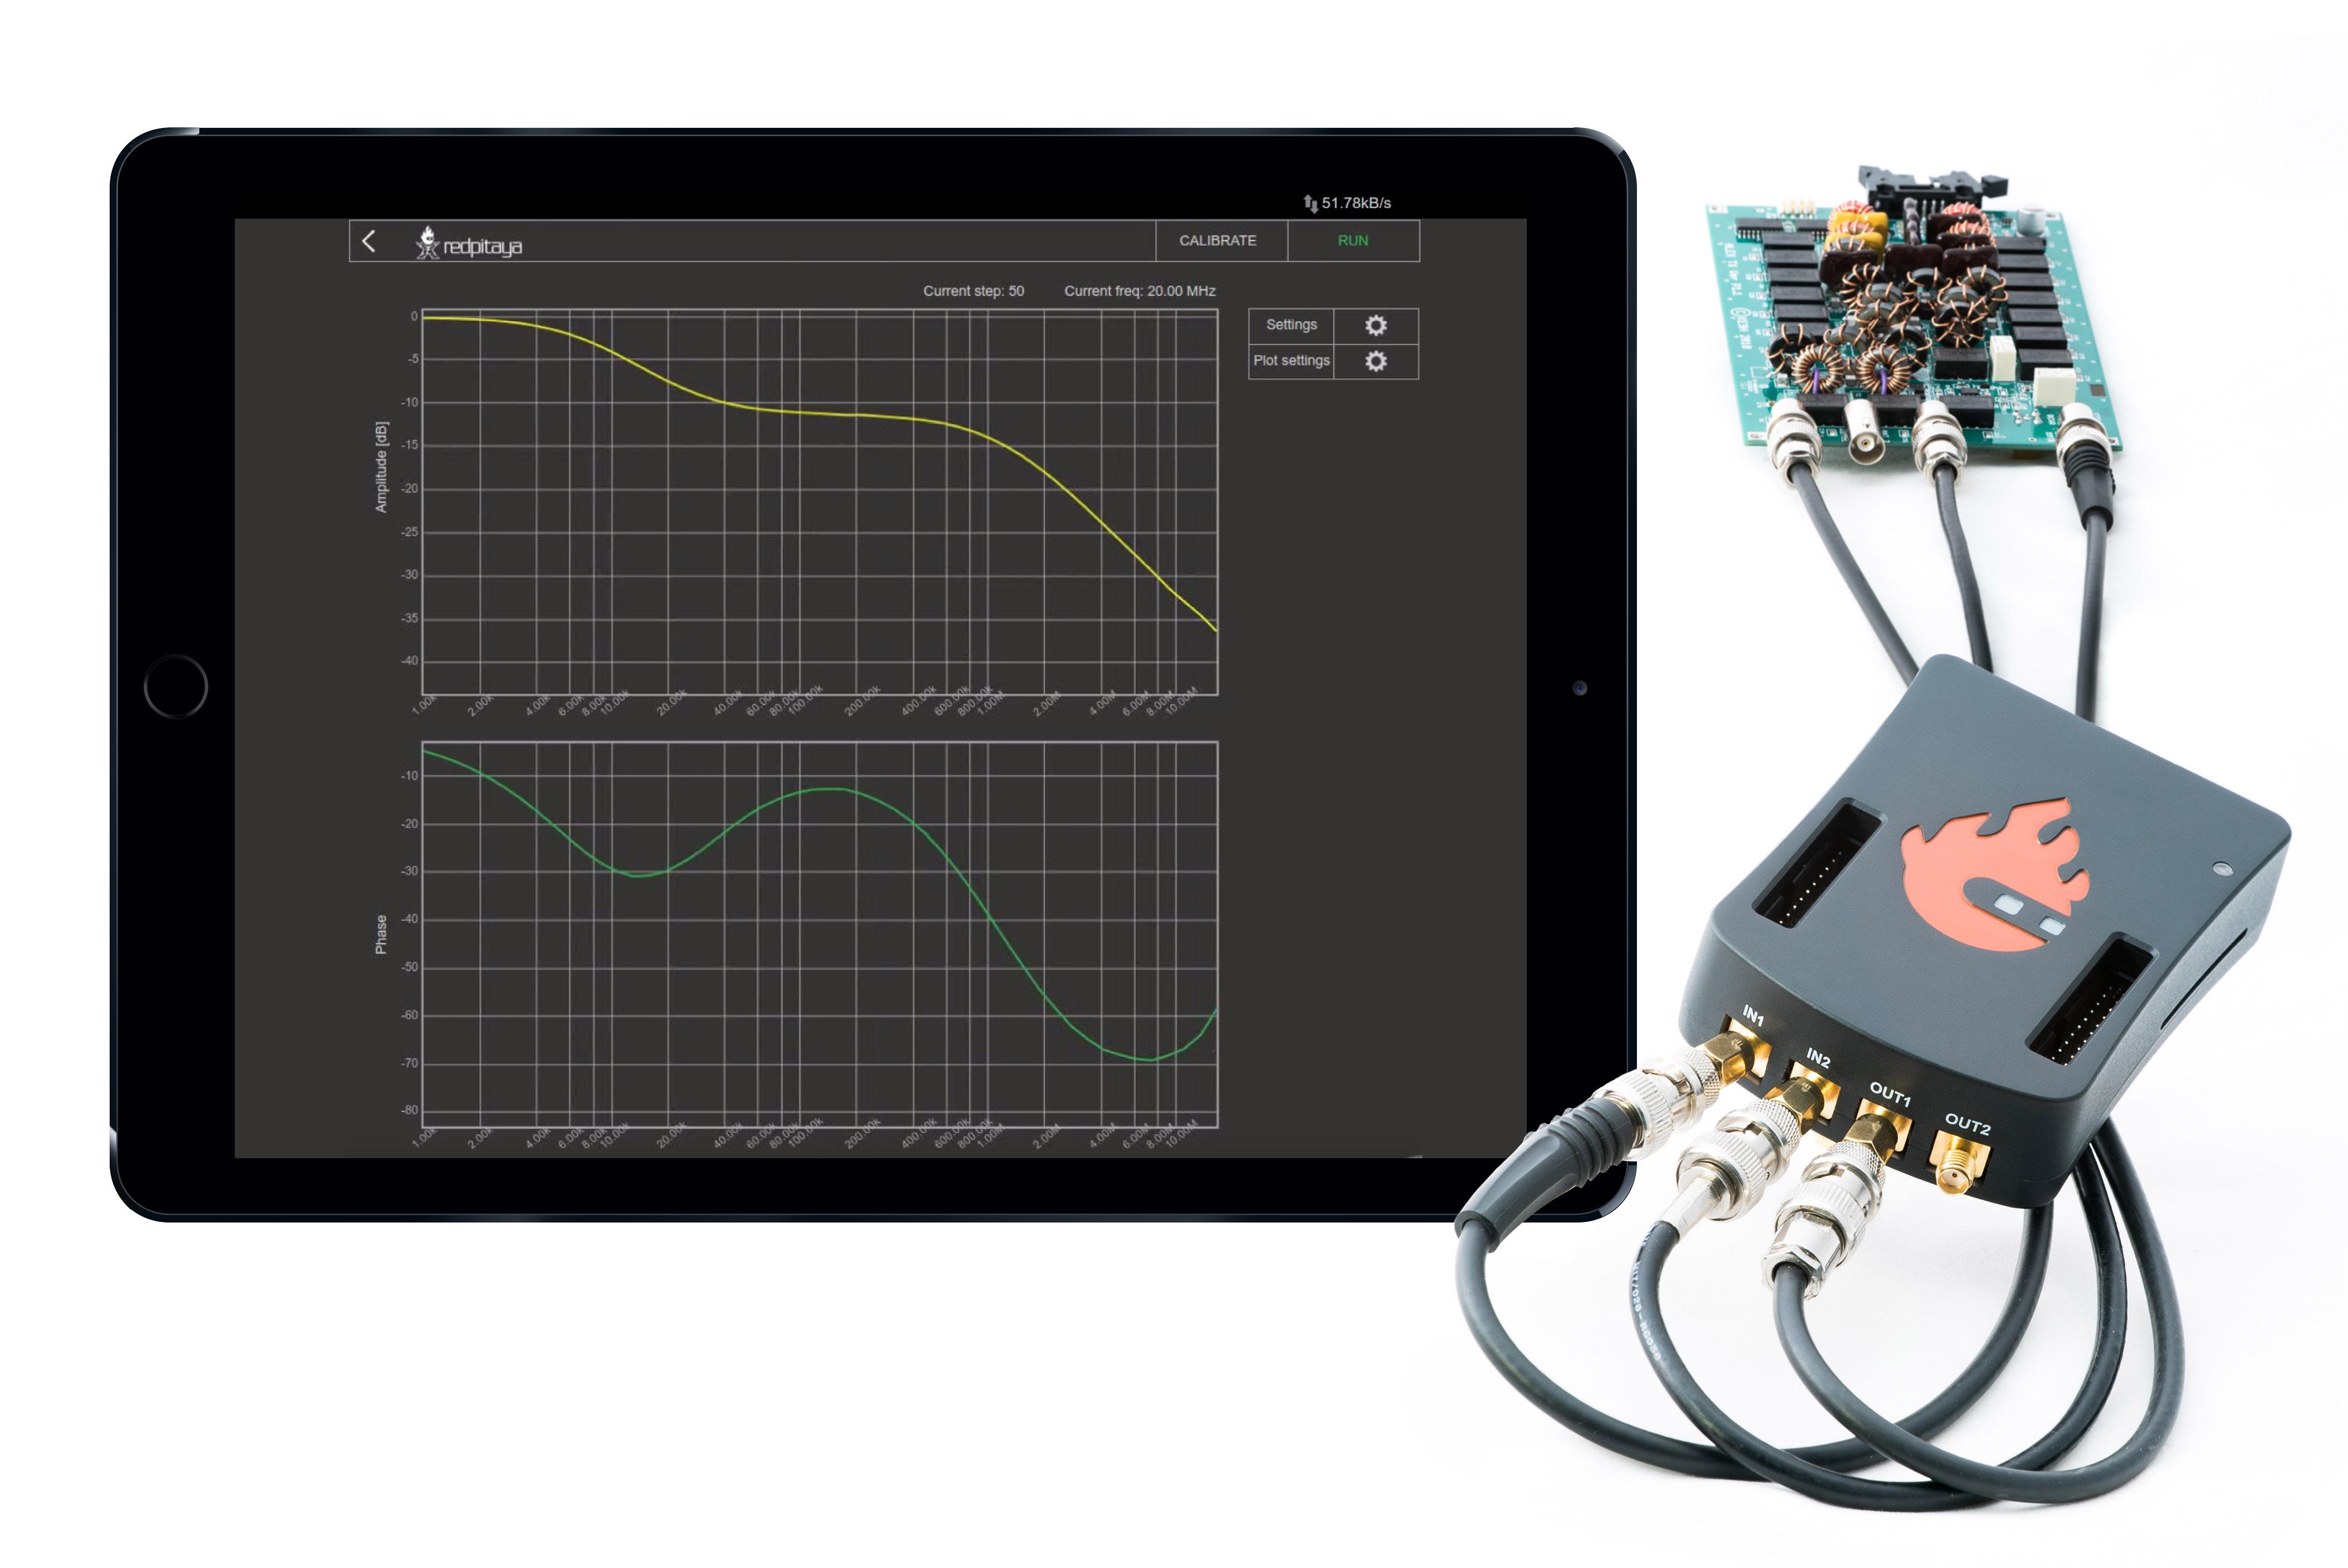 Bode Analyzer Connections : Bode analyzer — red pitaya stemlab documentation